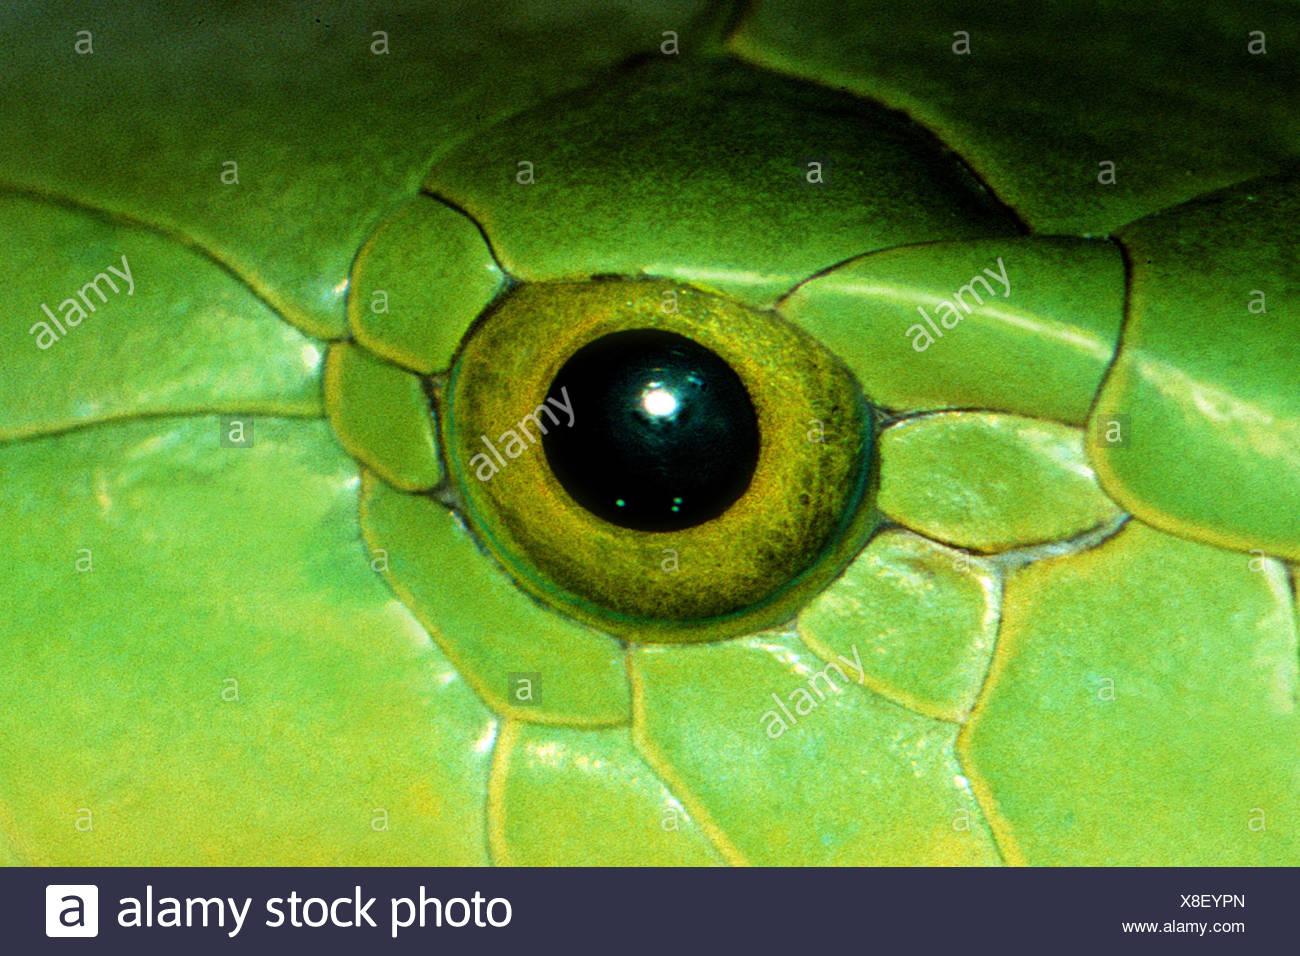 snake eye stock photo 280612269 alamy